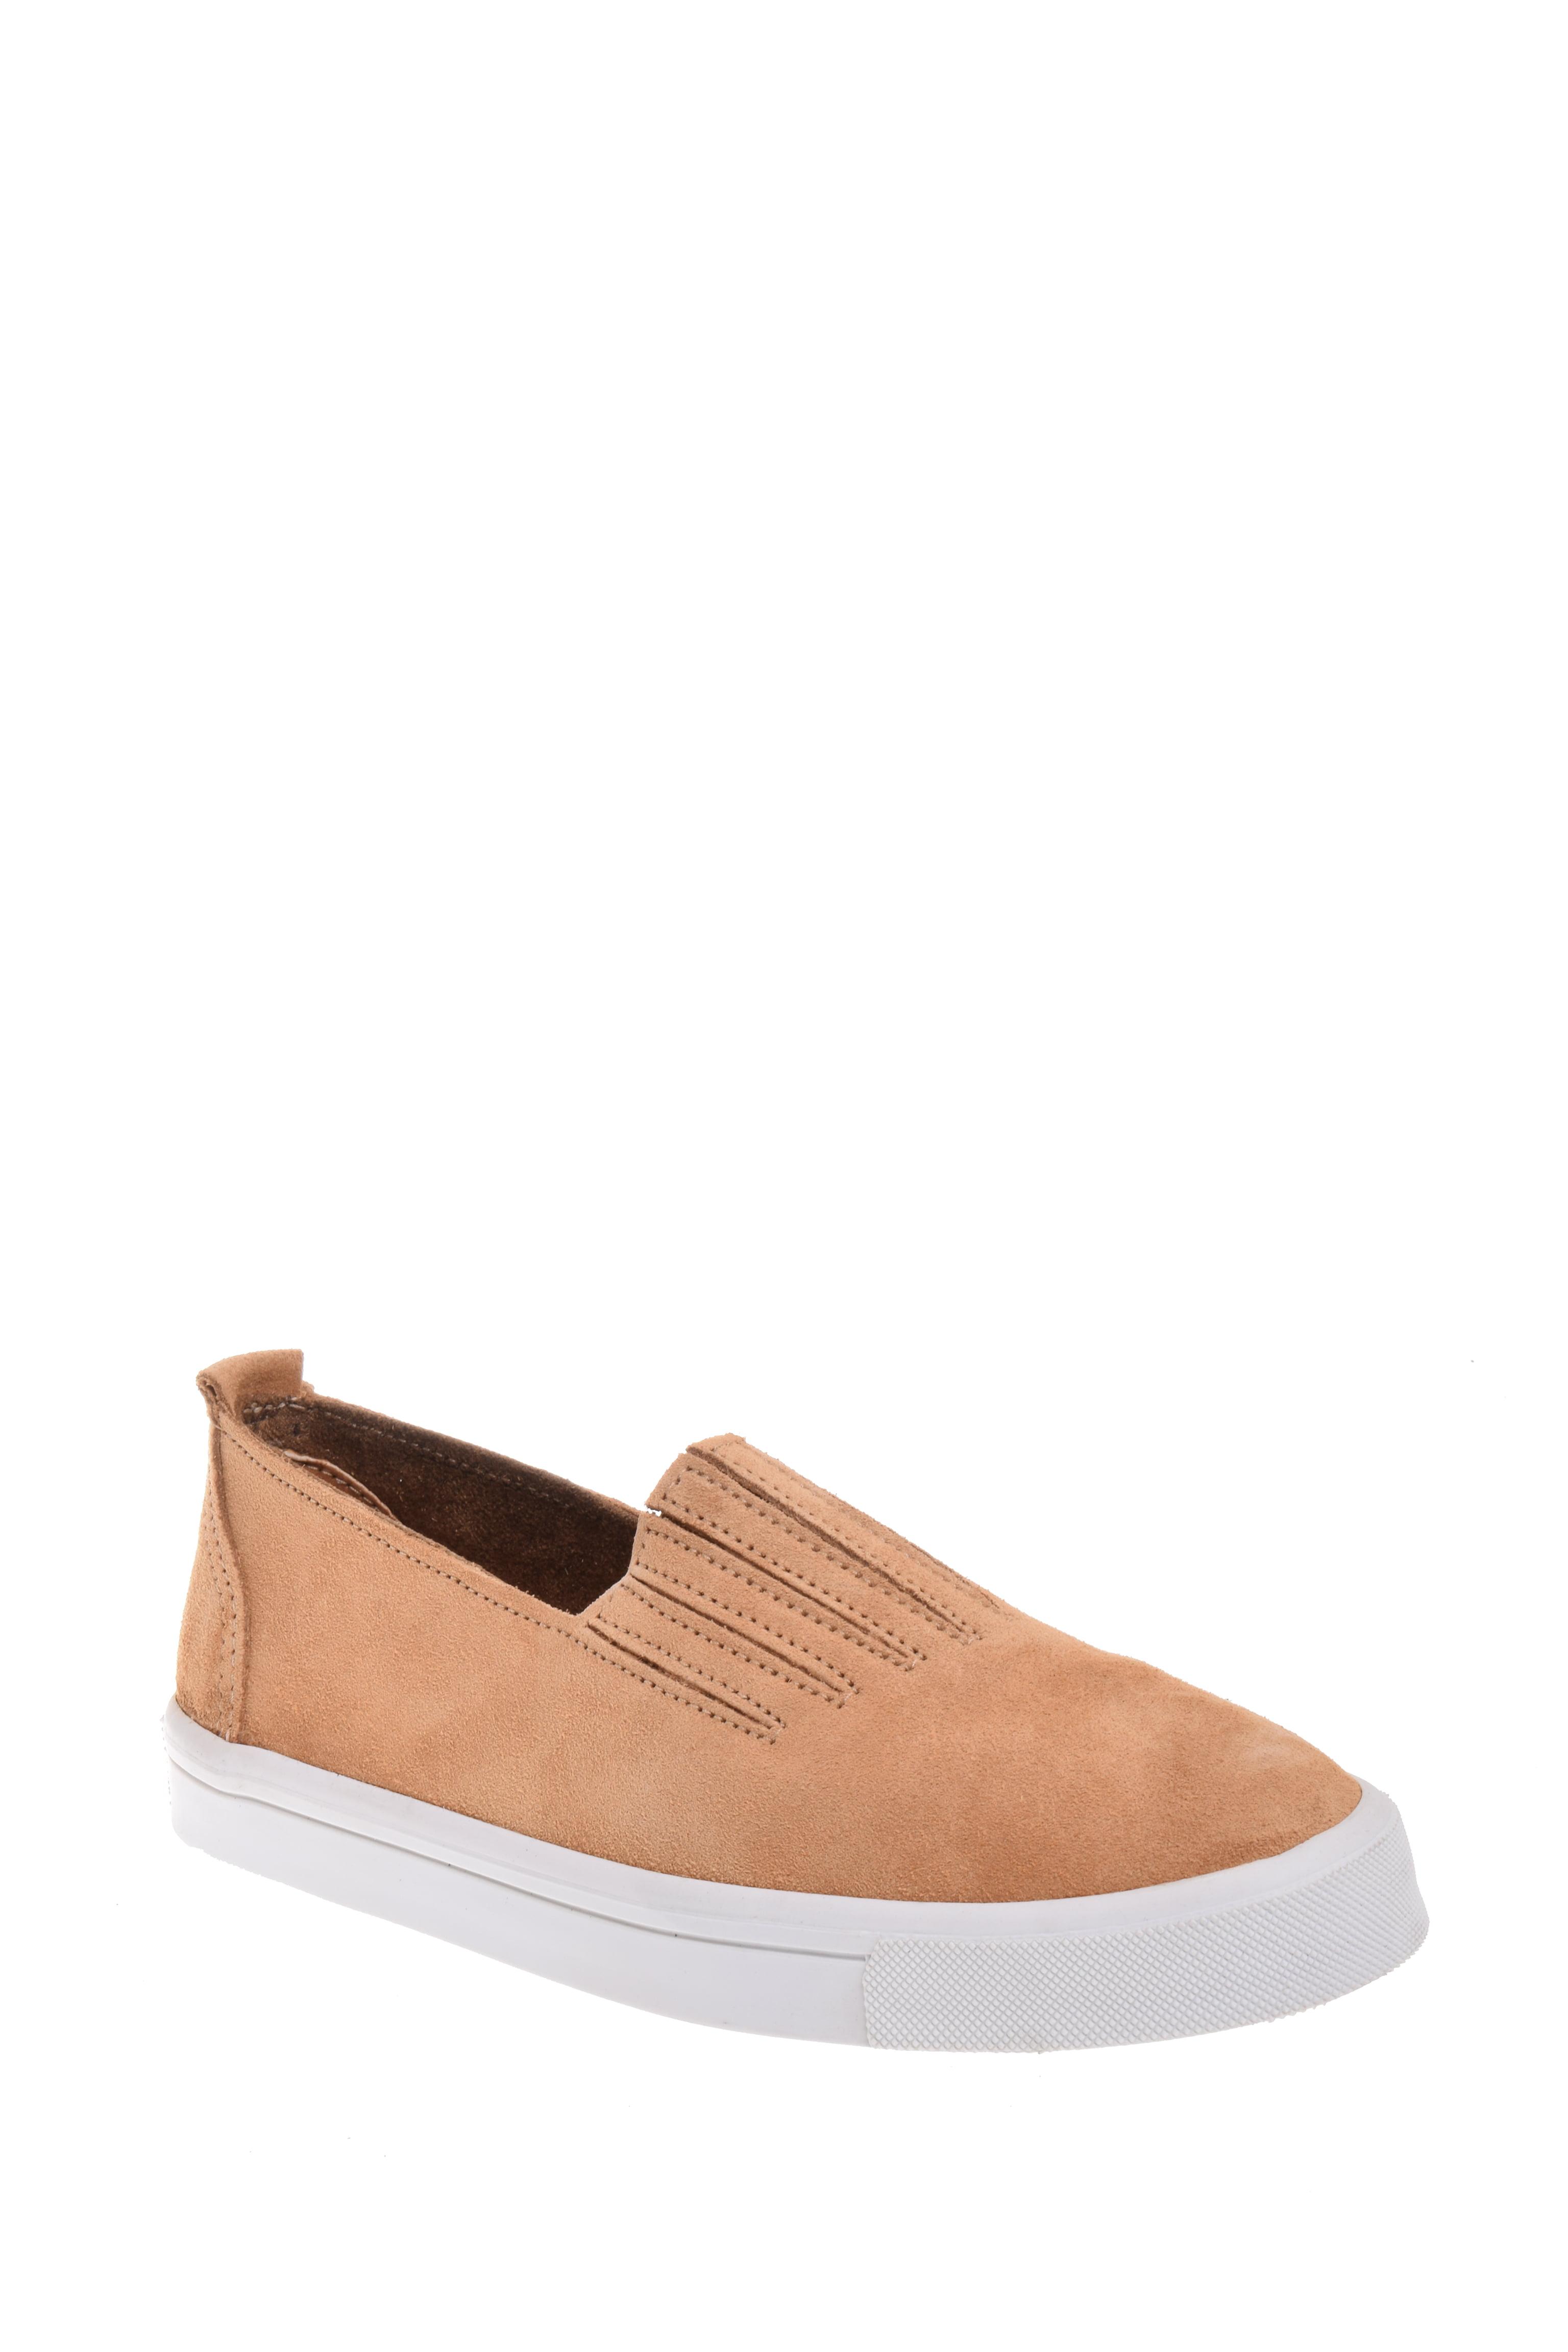 Minnetonka Gabi Slip-On Sneaker Taupe by